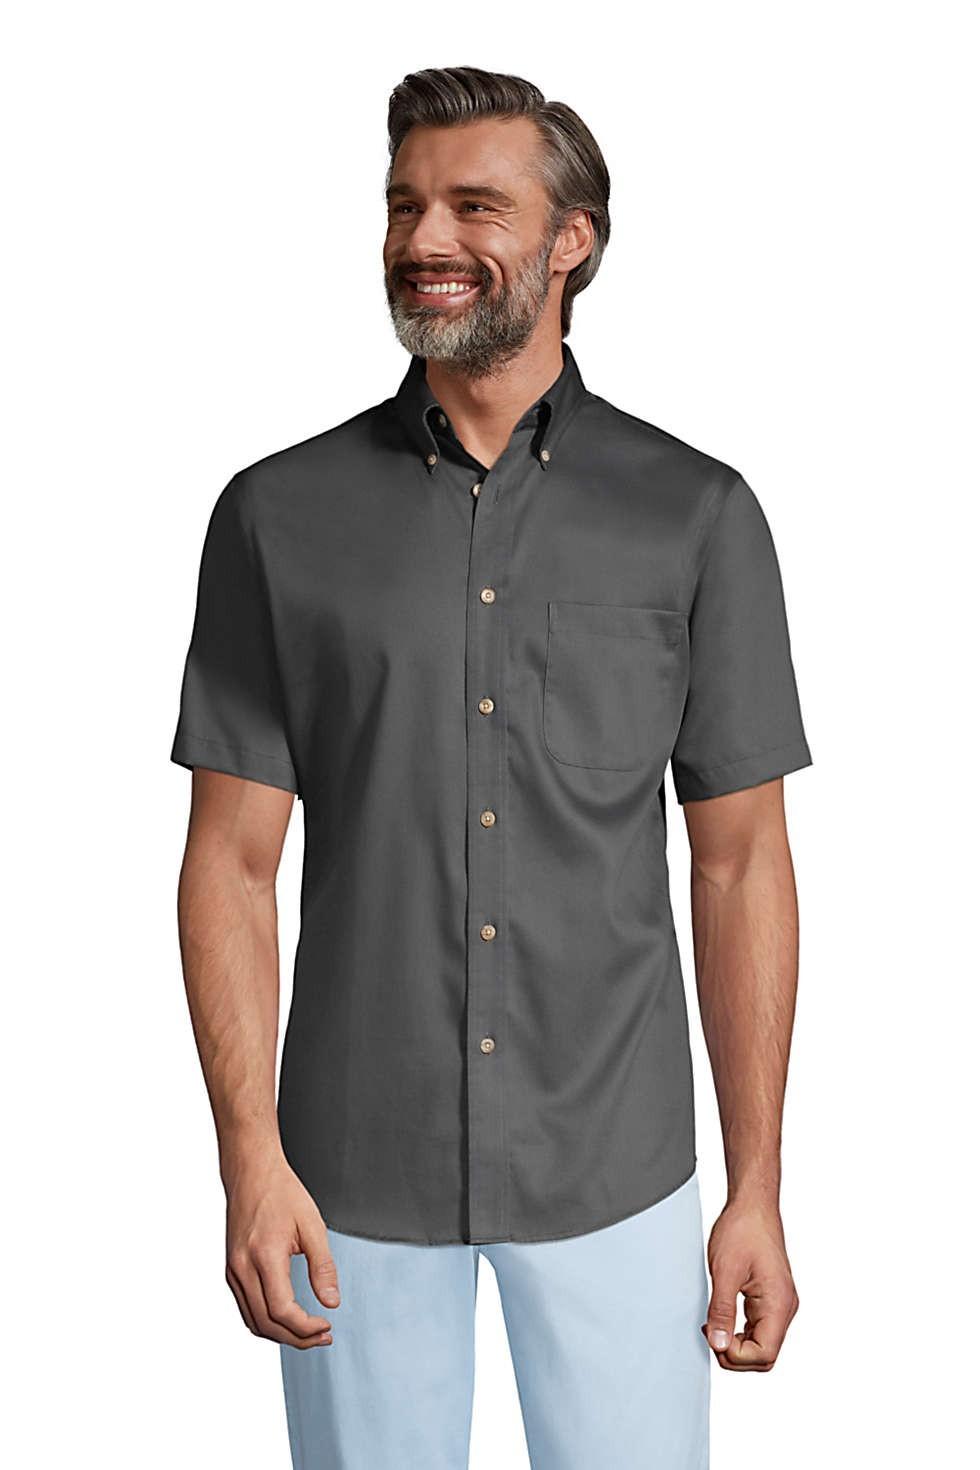 3 Pallets of Men's Shorts, Shirts & More, 1 Ext. Retail $52,018, Dodgeville, WI